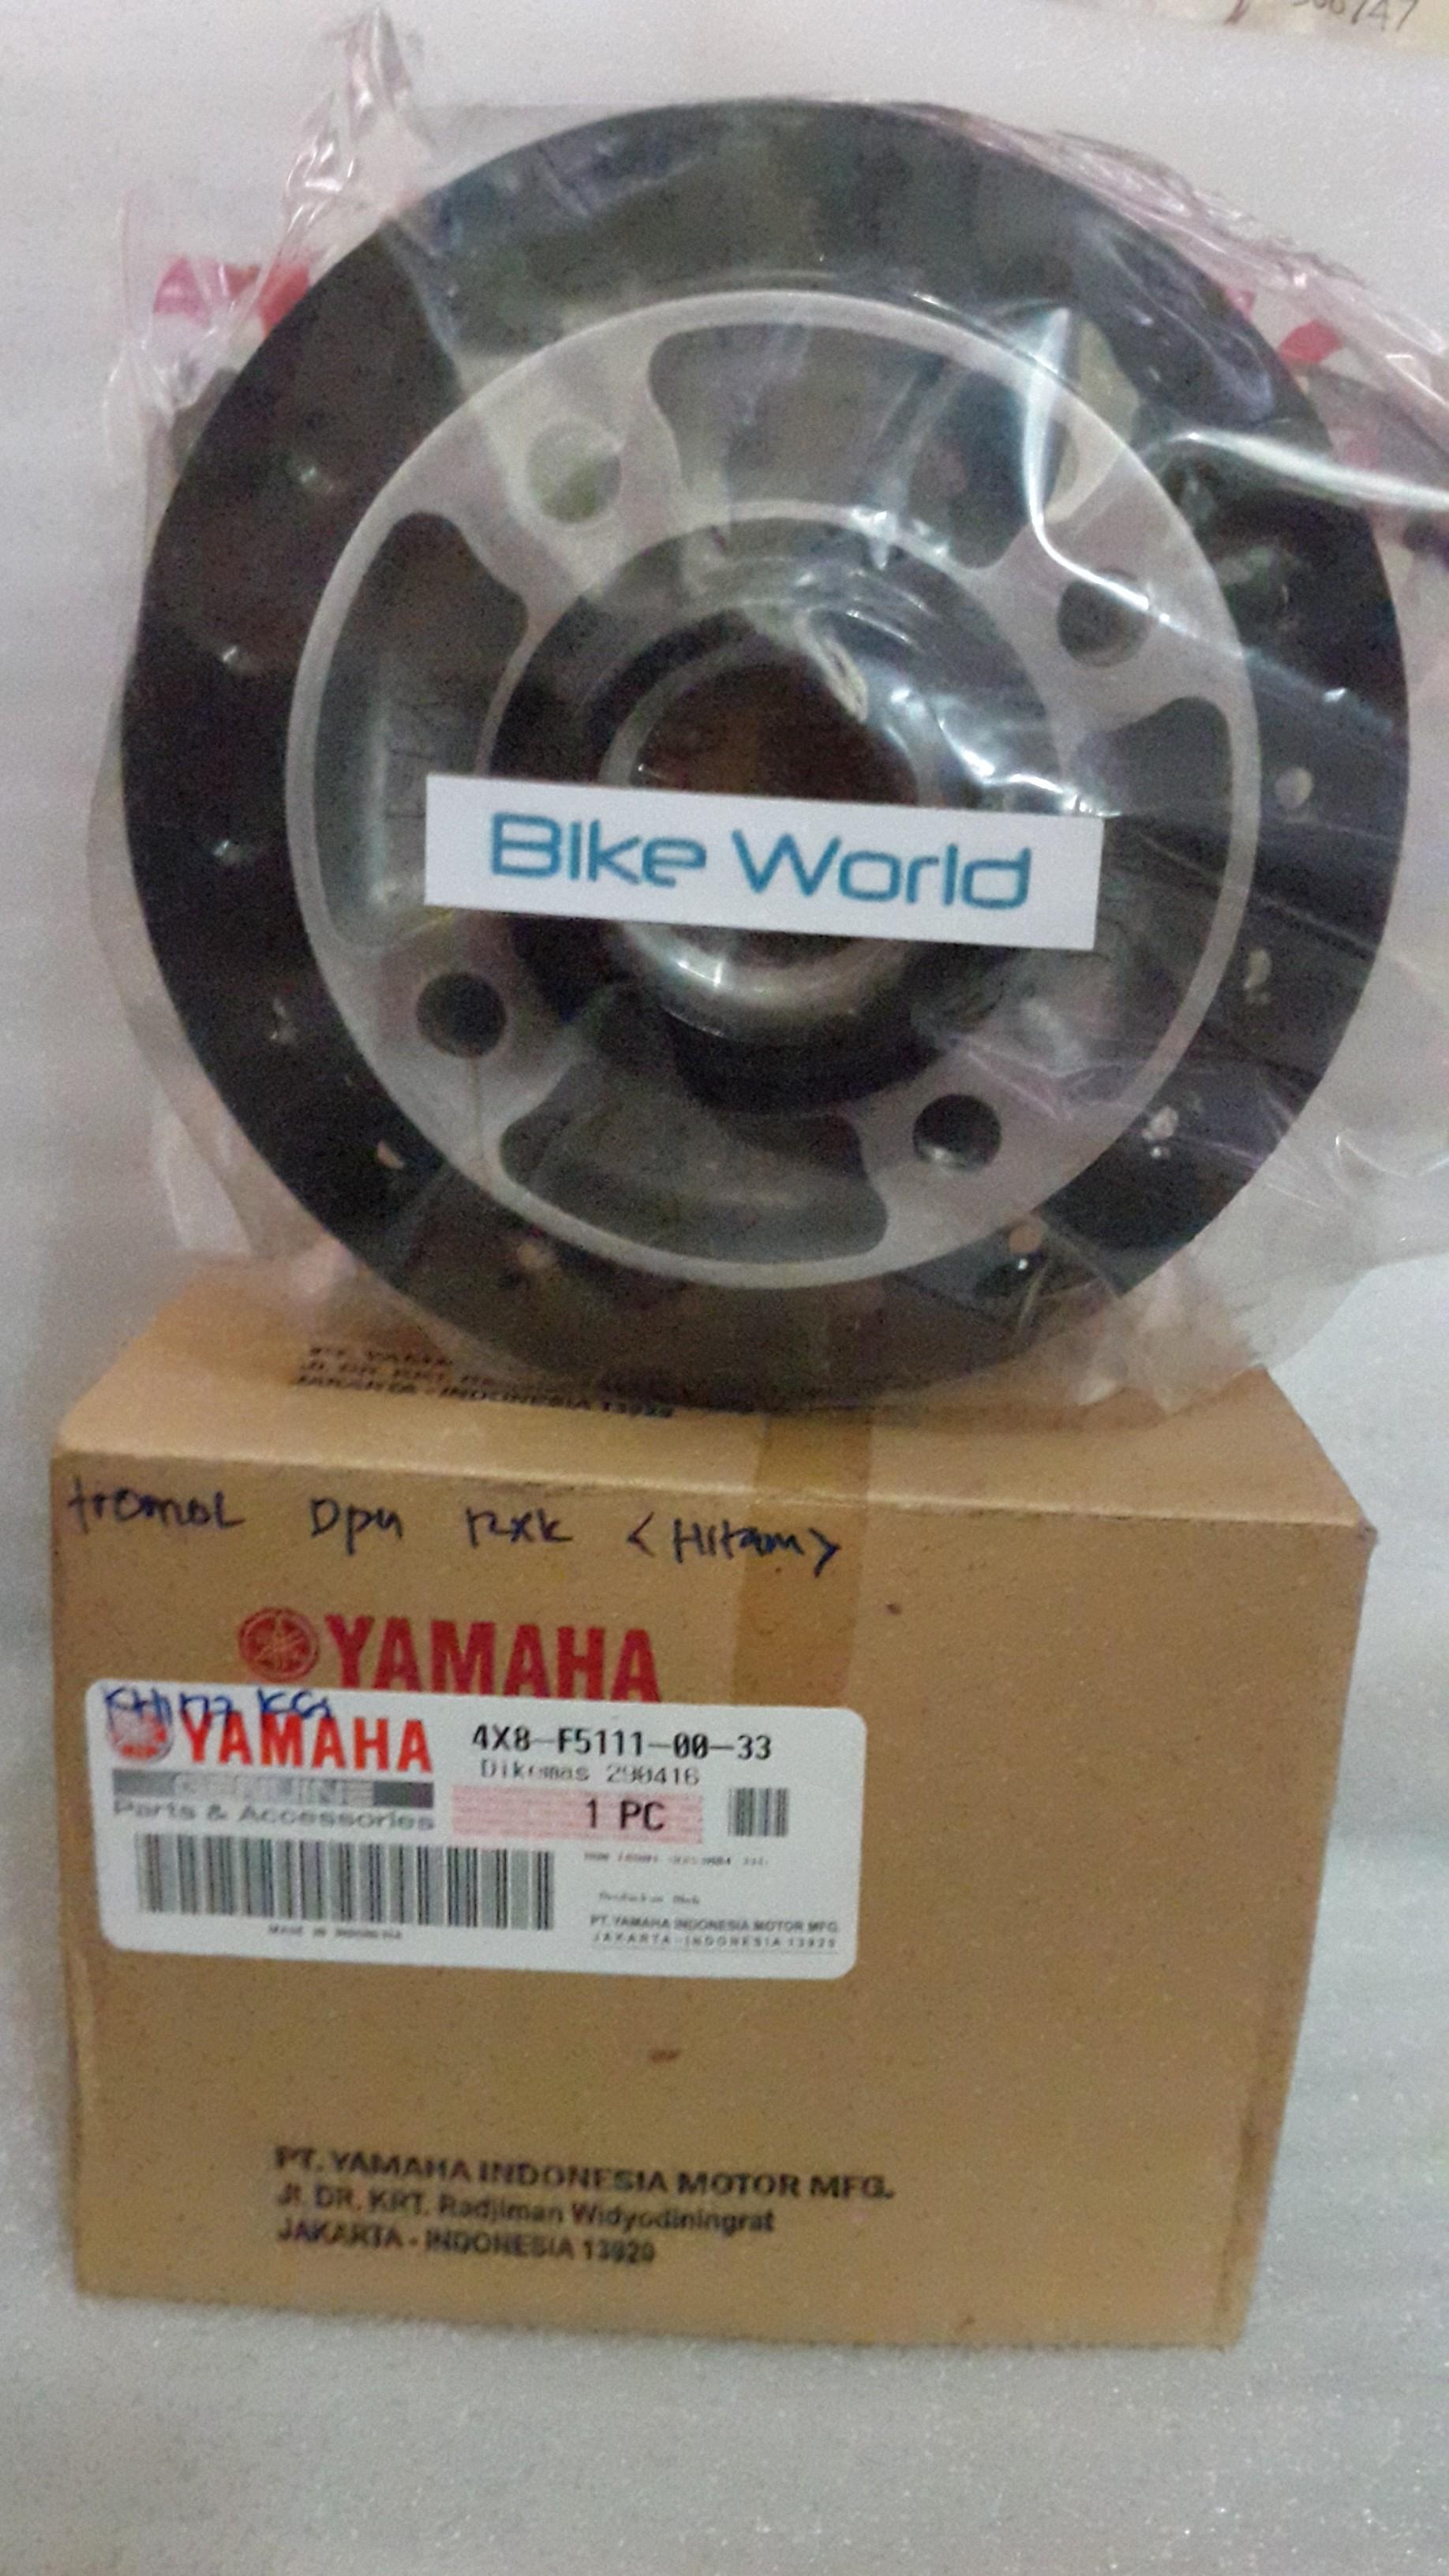 SPECIAL Tromol Depan RX King Yamaha Genuine Parts MURAH MERIAH